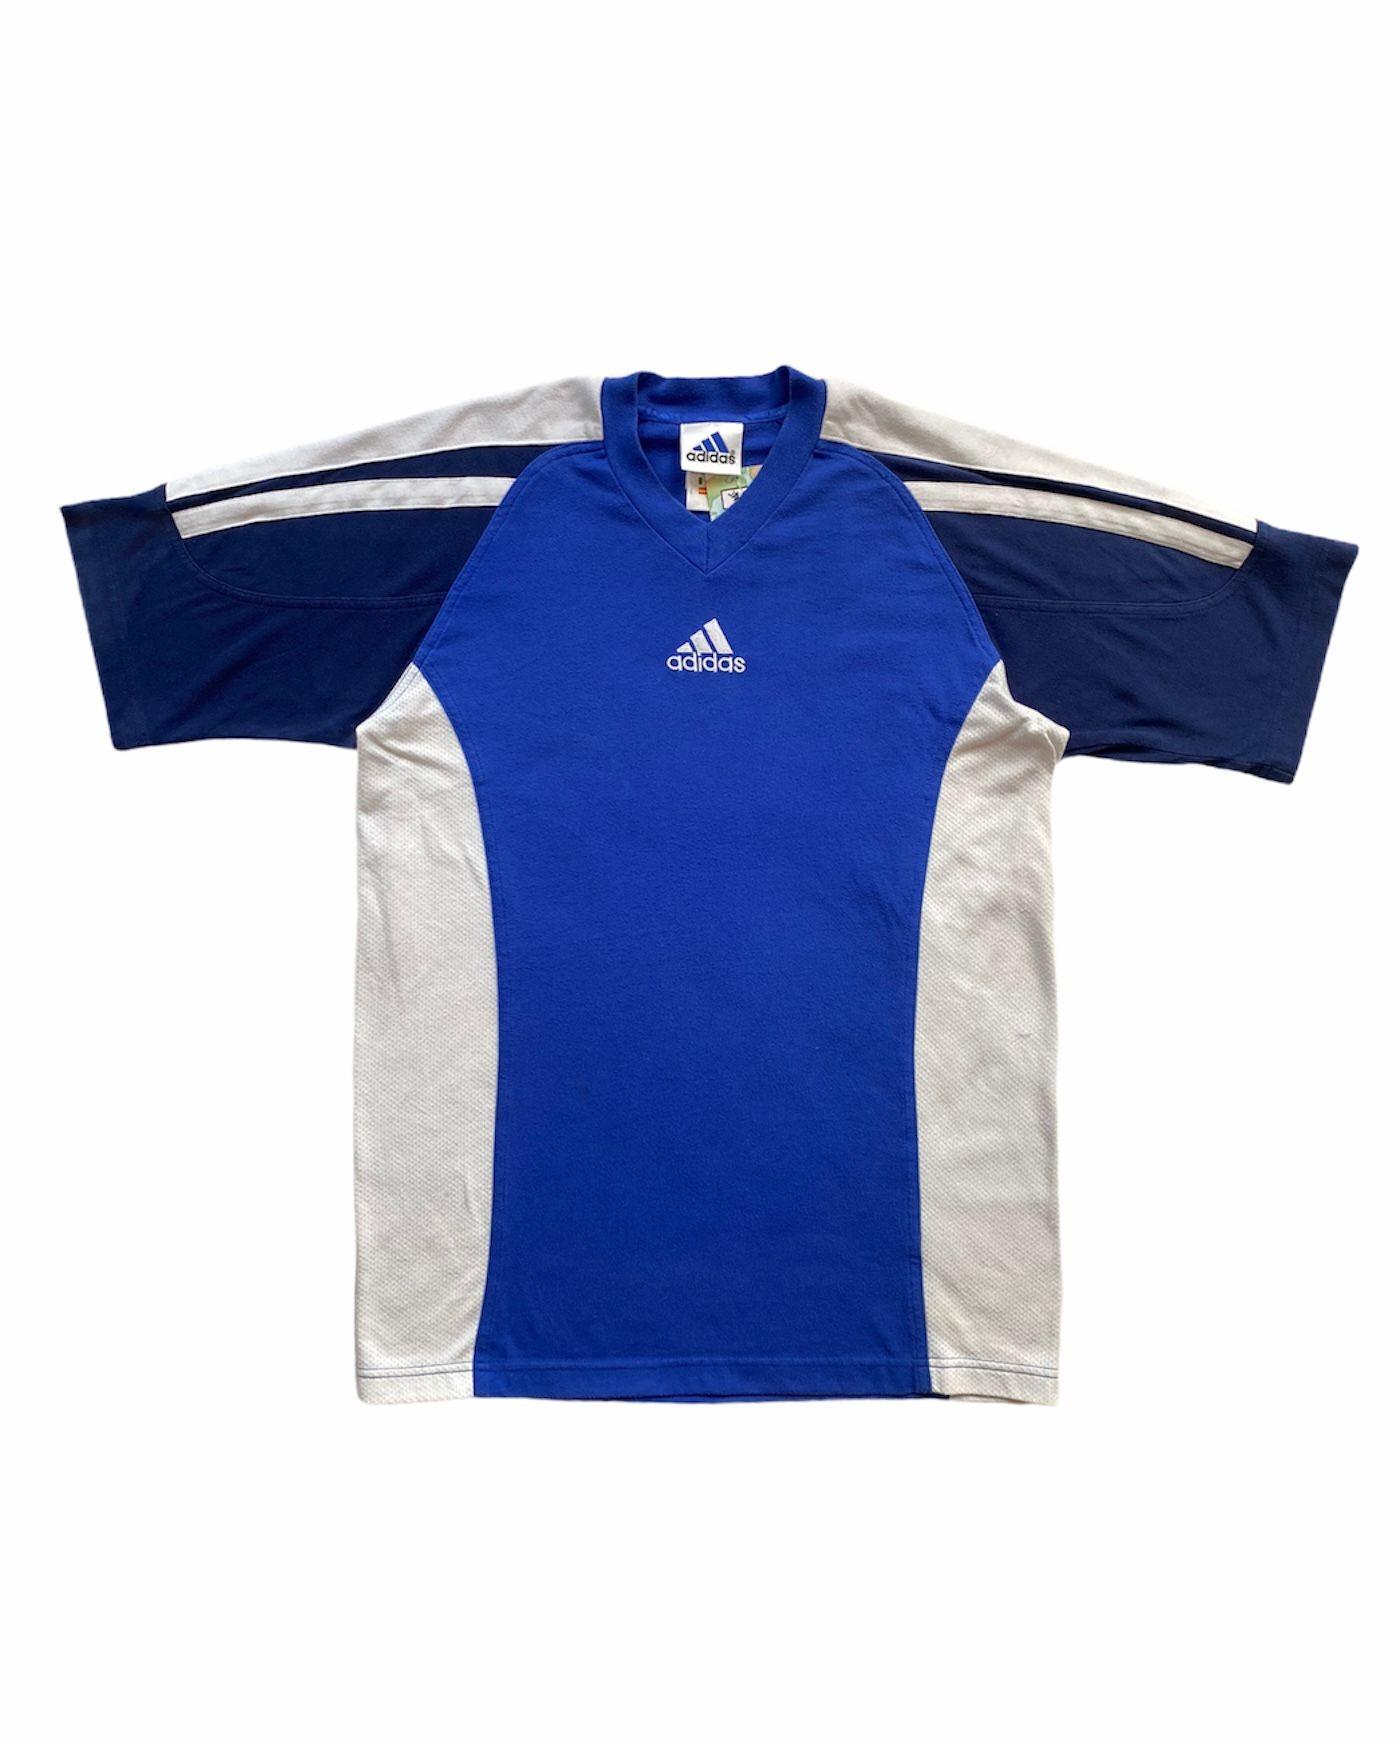 Adidas 00's Vintage T Shirt (M)